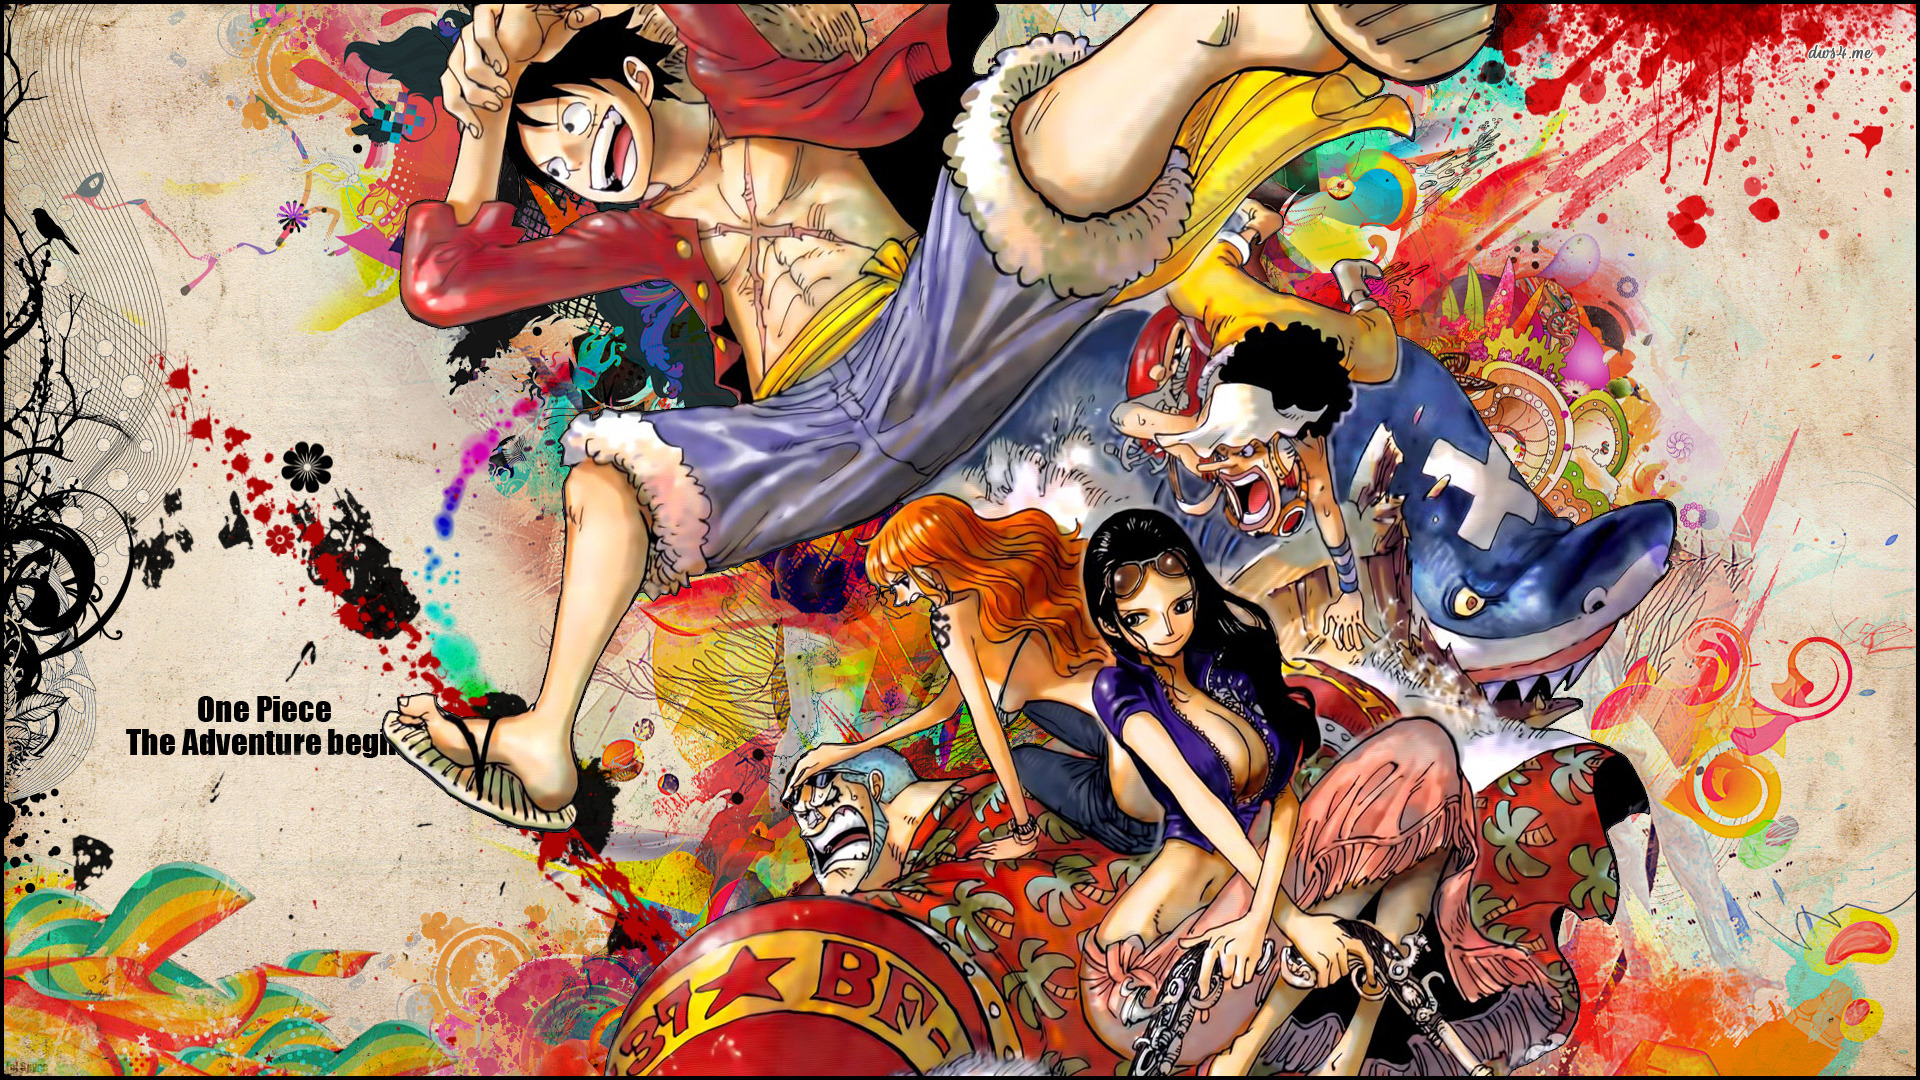 One Piece Wallpaper Background Download